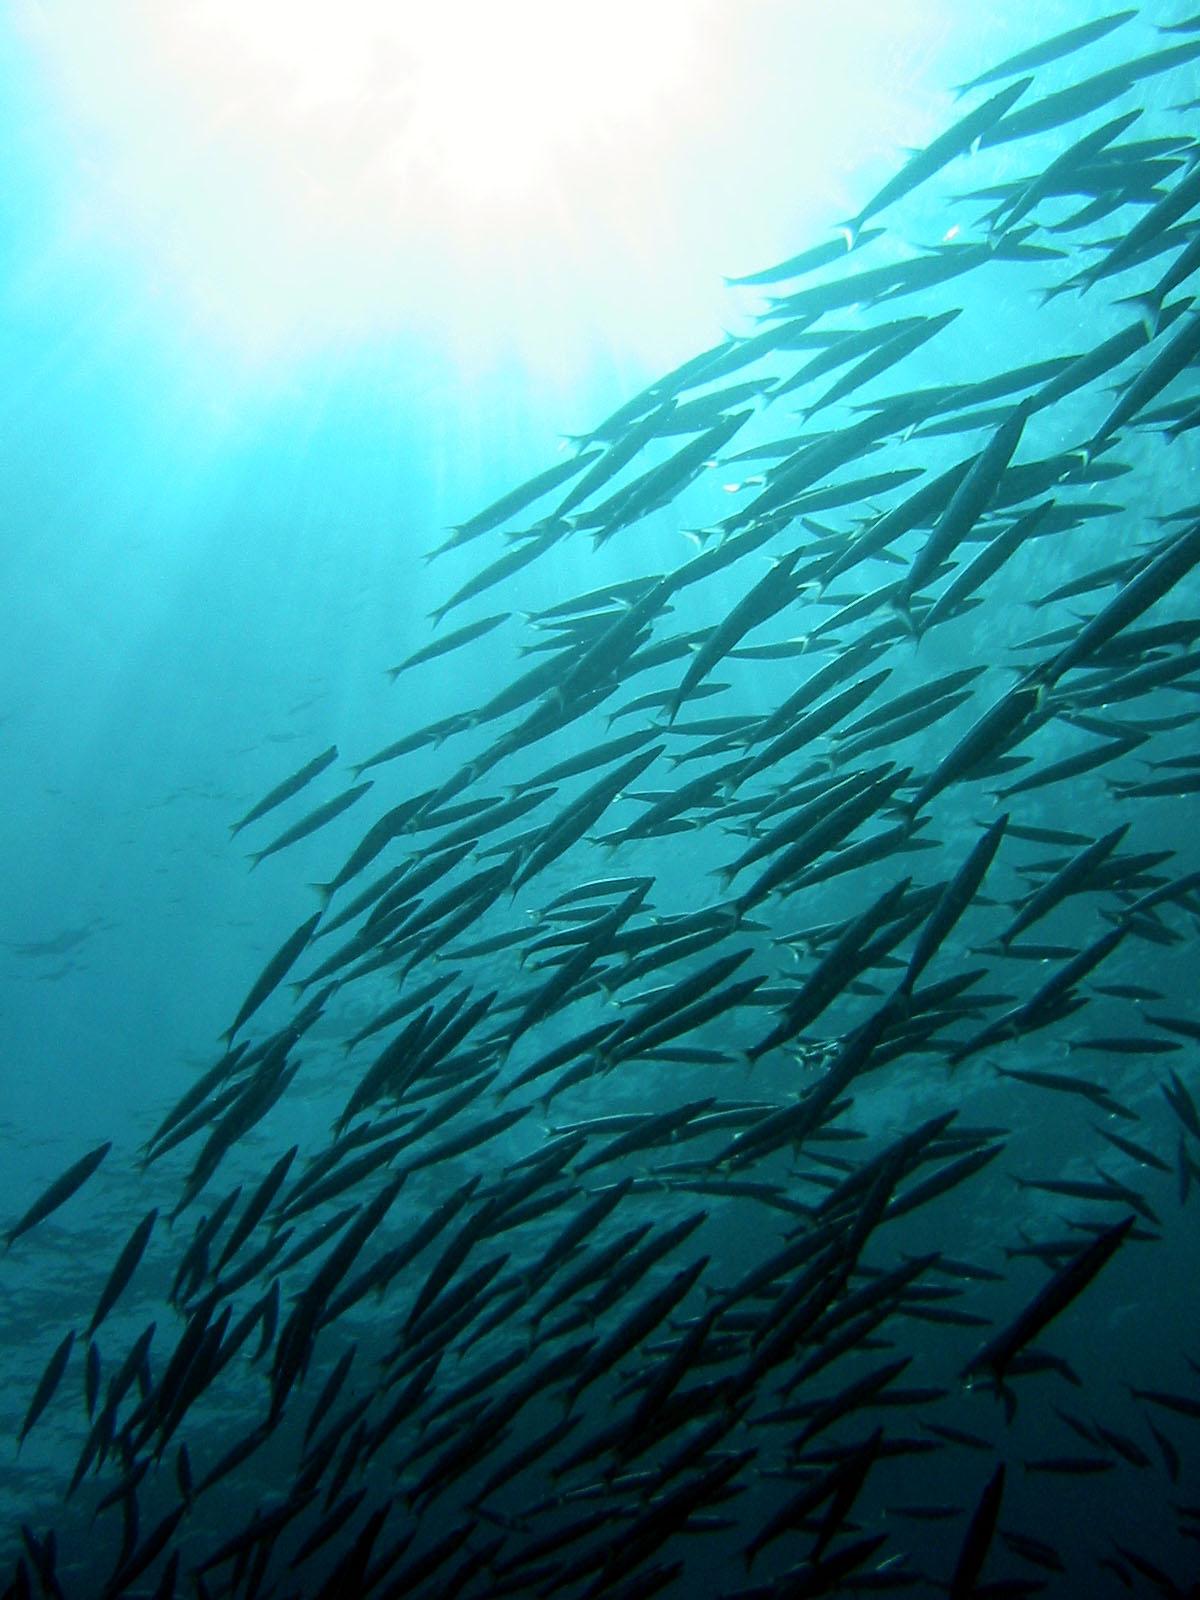 Yellowtail barracuda in the Mergui Archipelago